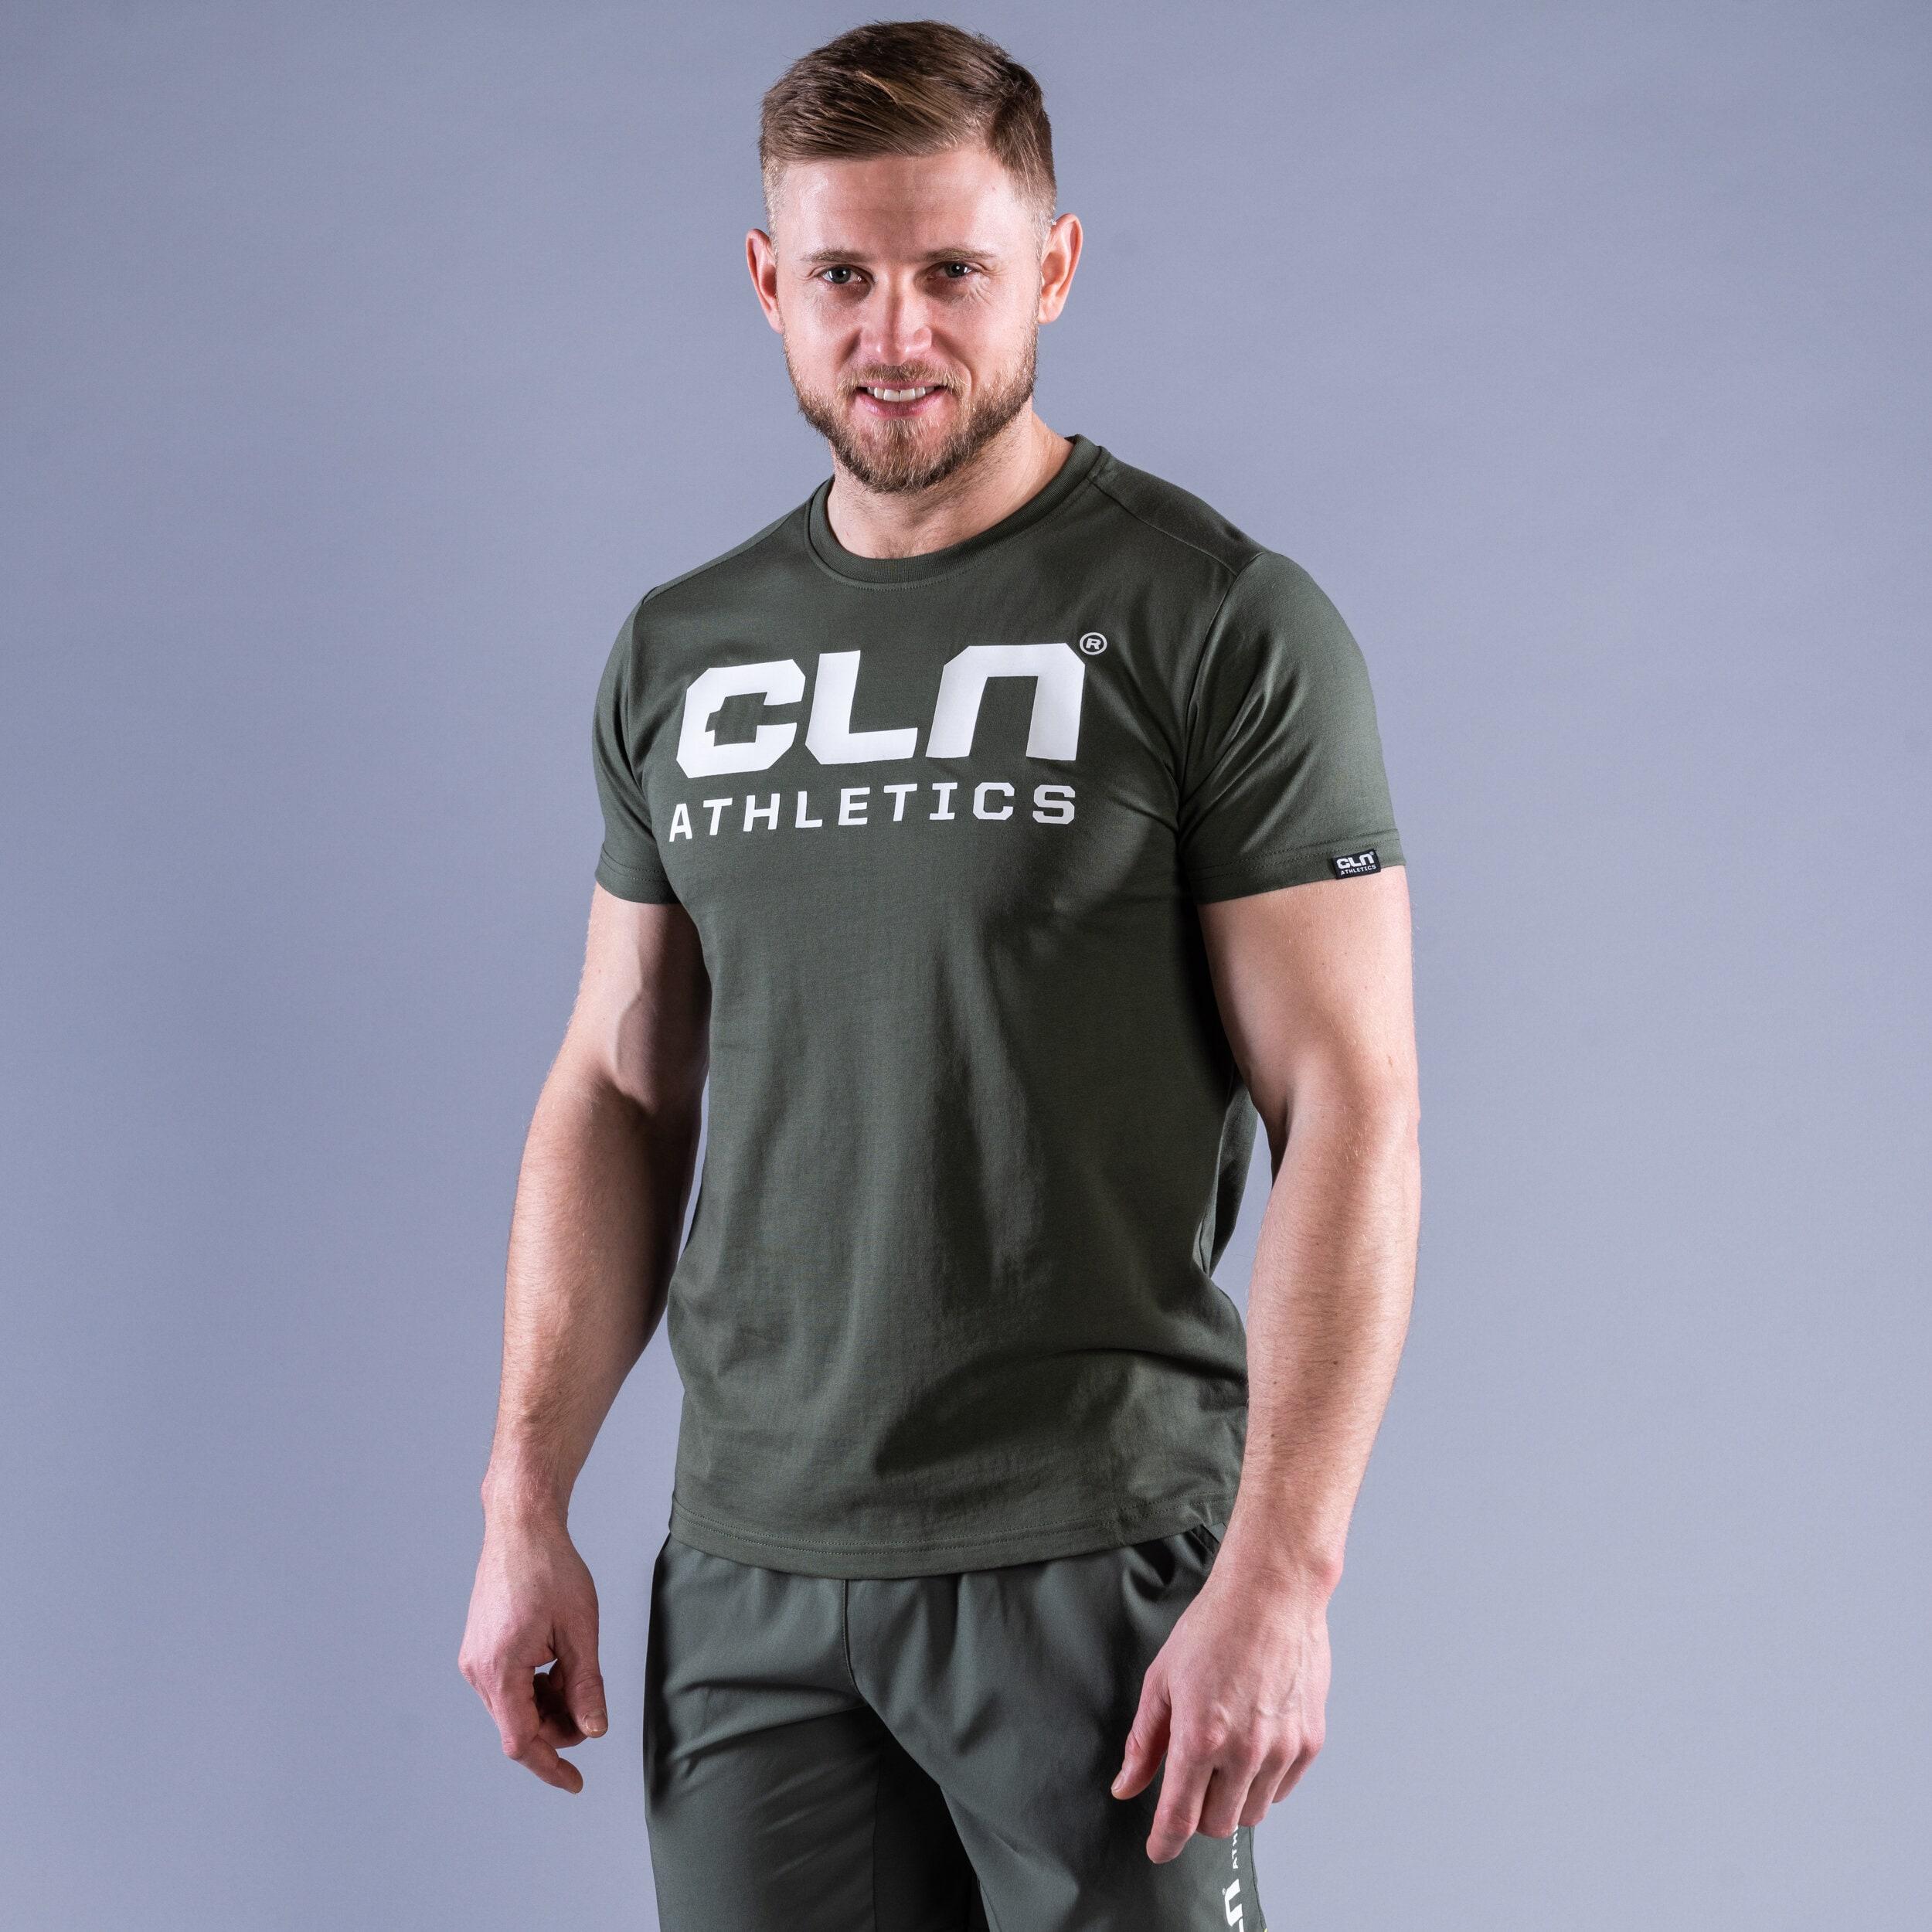 Package Dino shorts - Promo t-shirt Green